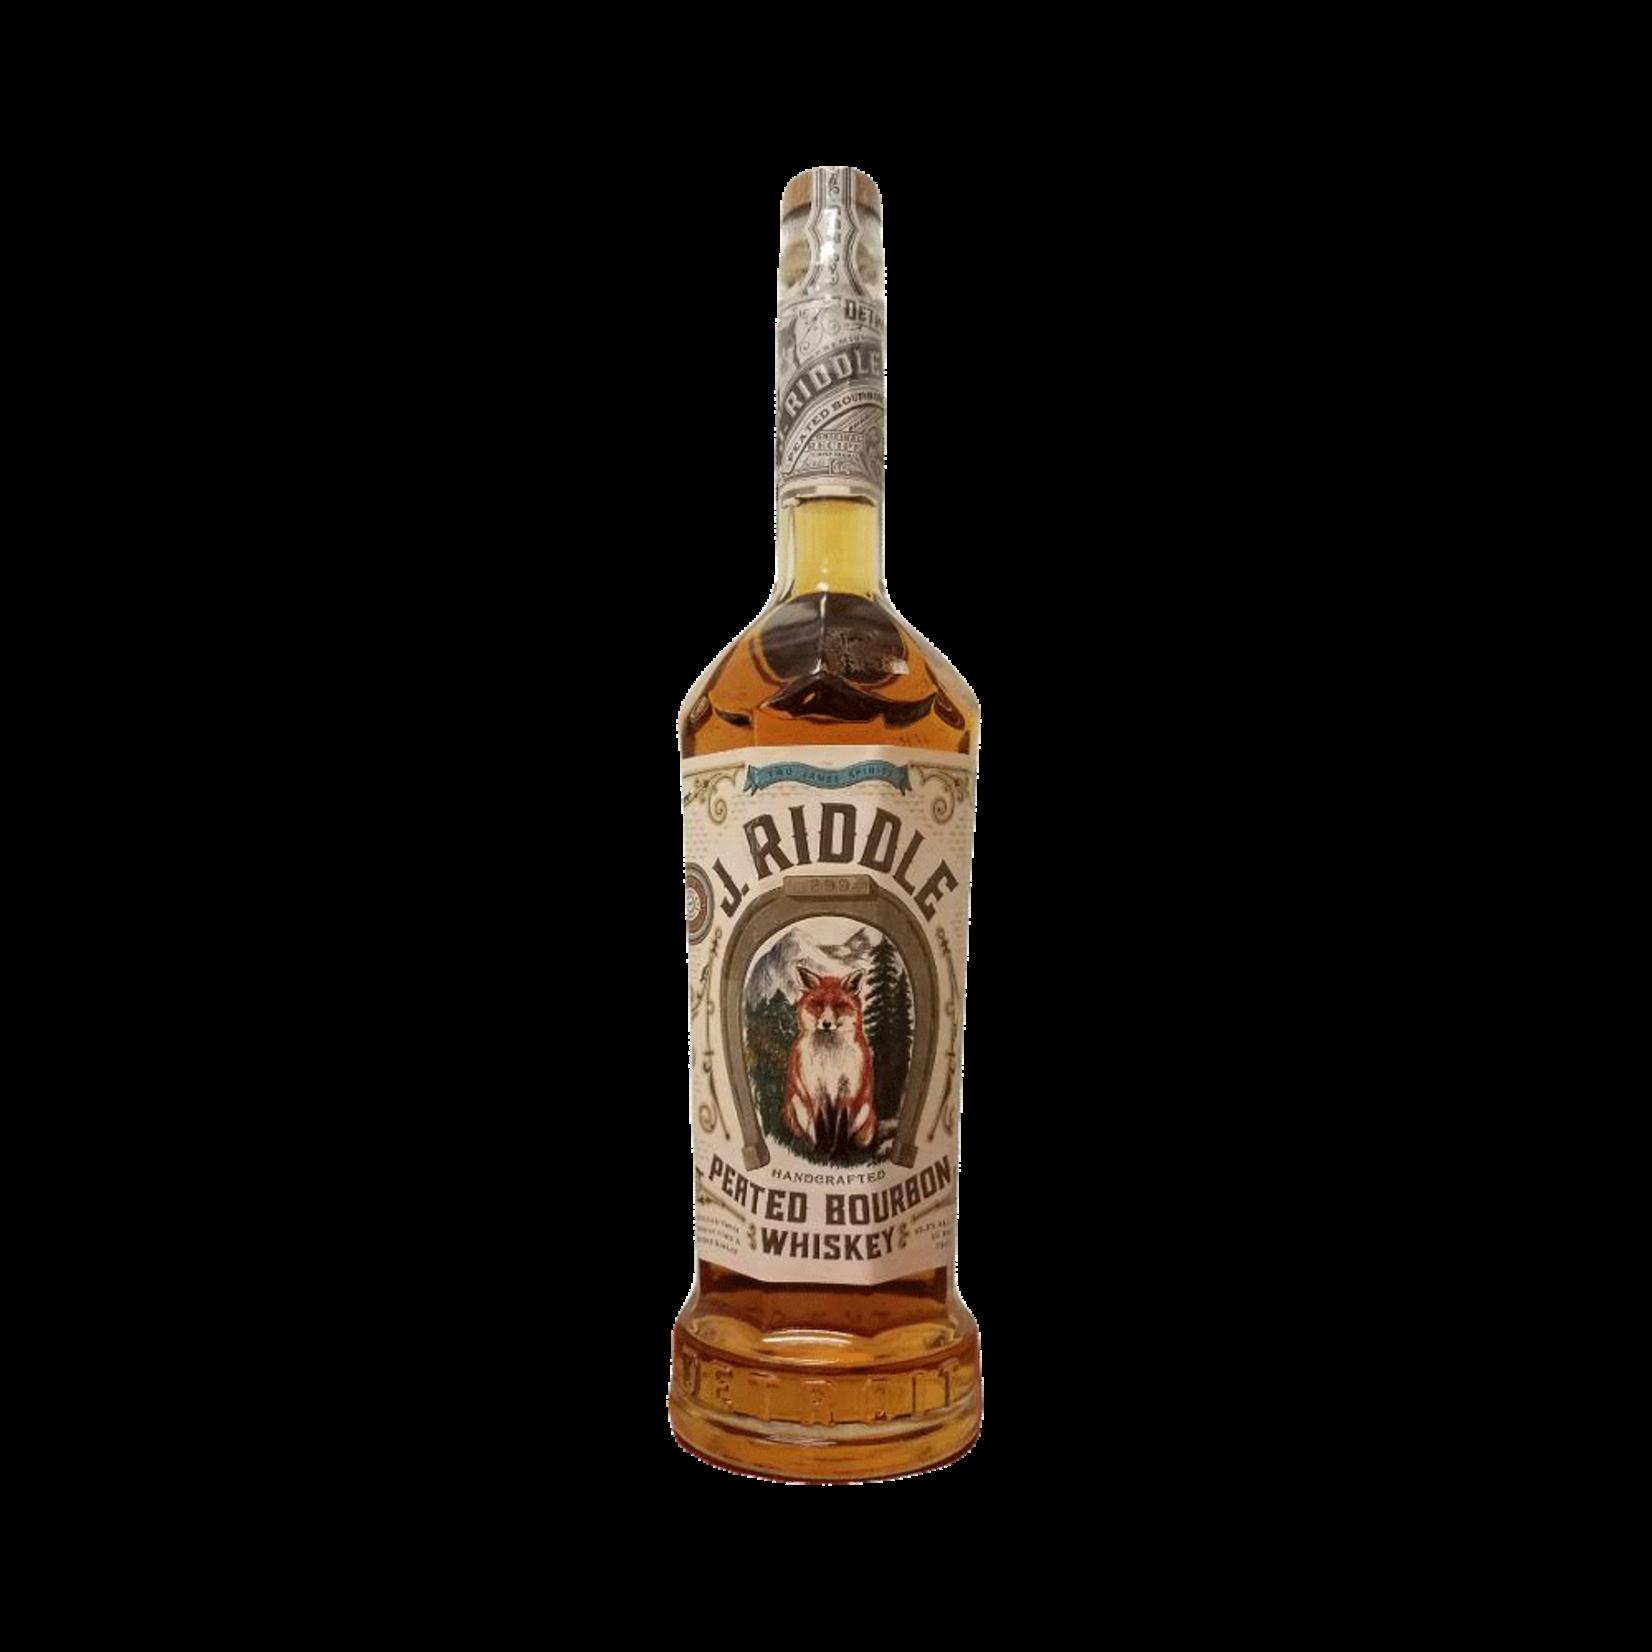 Spirits Two James Spirits J. Riddle Peated Bourbon Whiskey